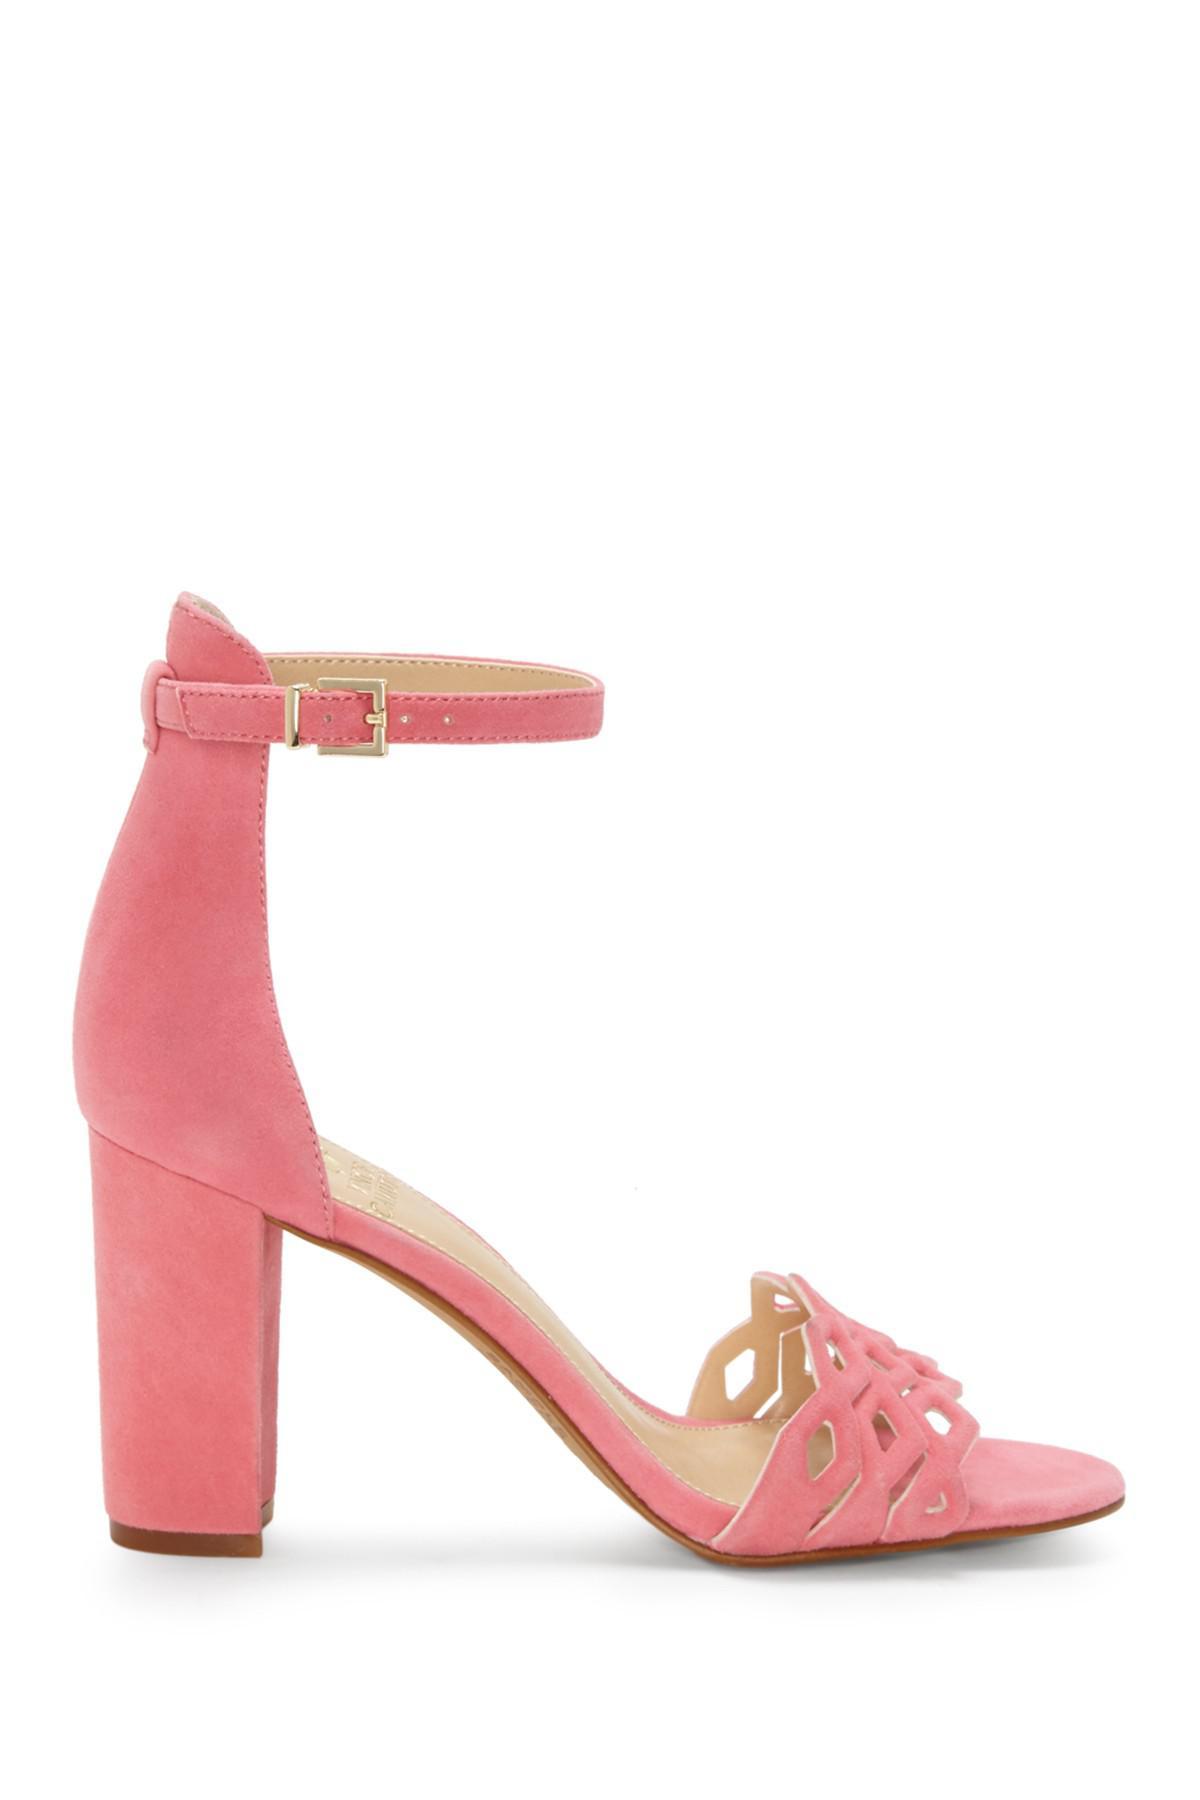 83e734081f6 Vince Camuto - Pink Caveena Block Heel Sandal (women) - Lyst. View  fullscreen